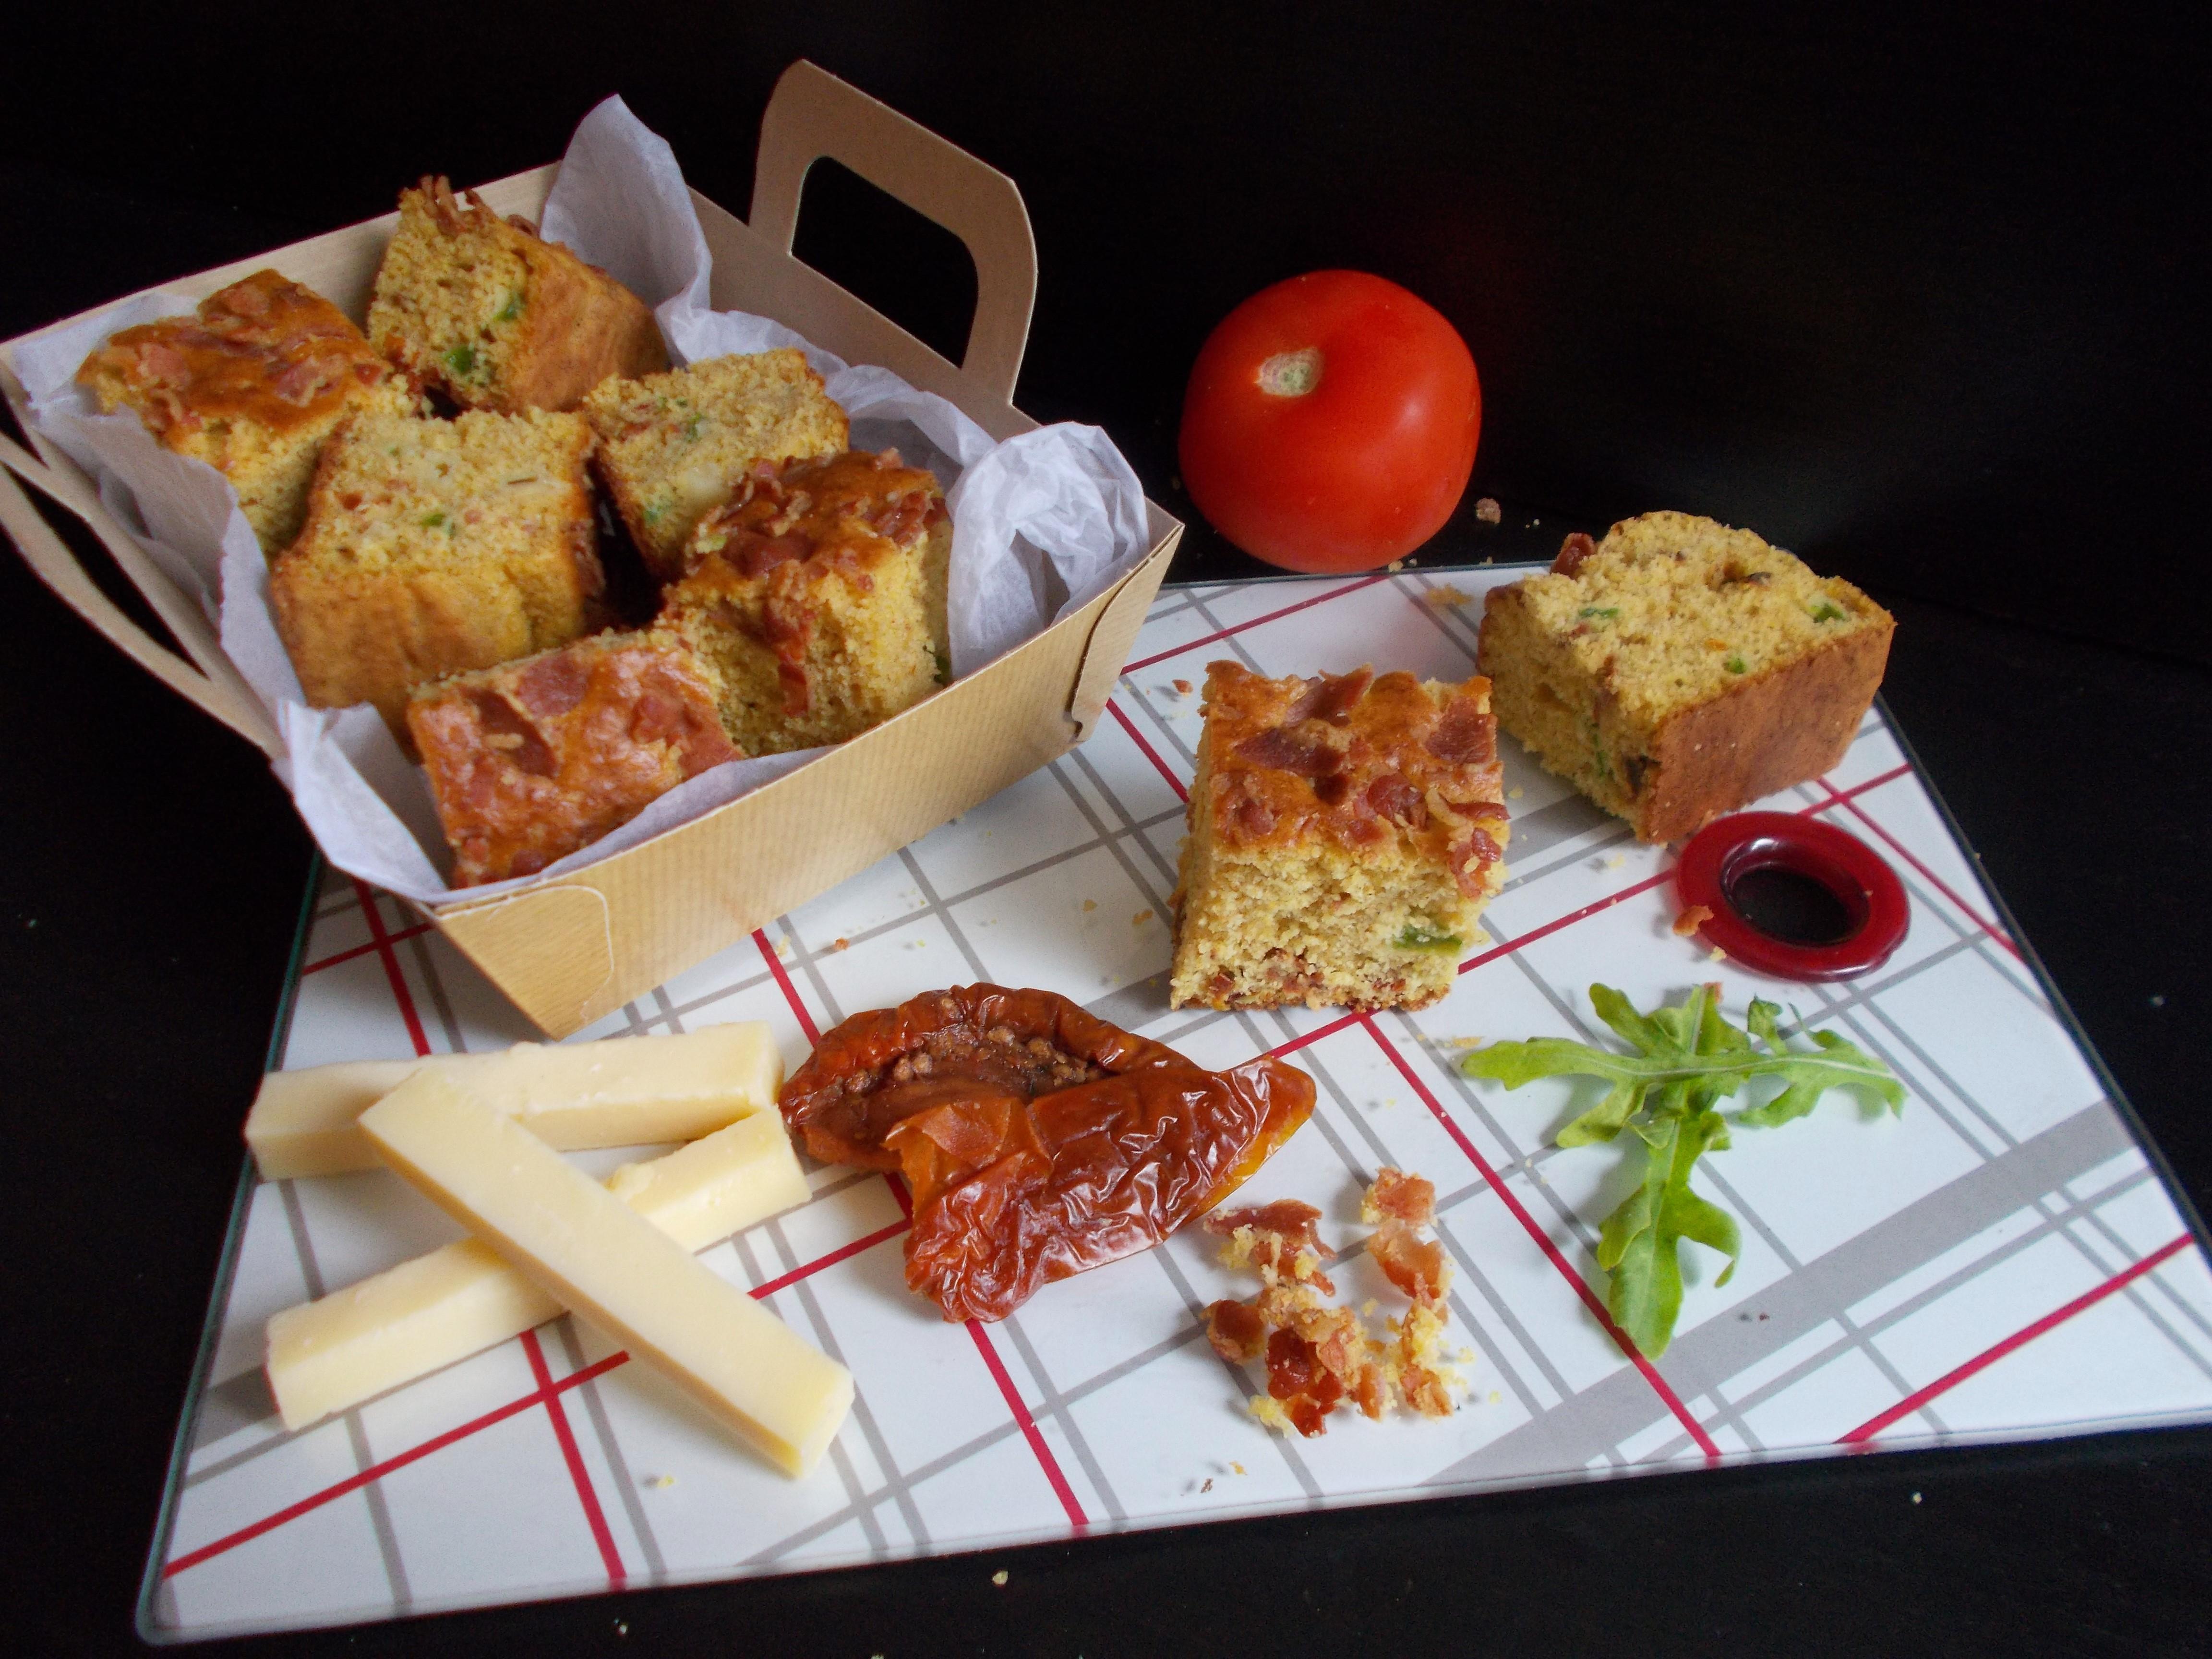 Fatso cornbread : bacon, jalapeño, tomate séchée et gruyère